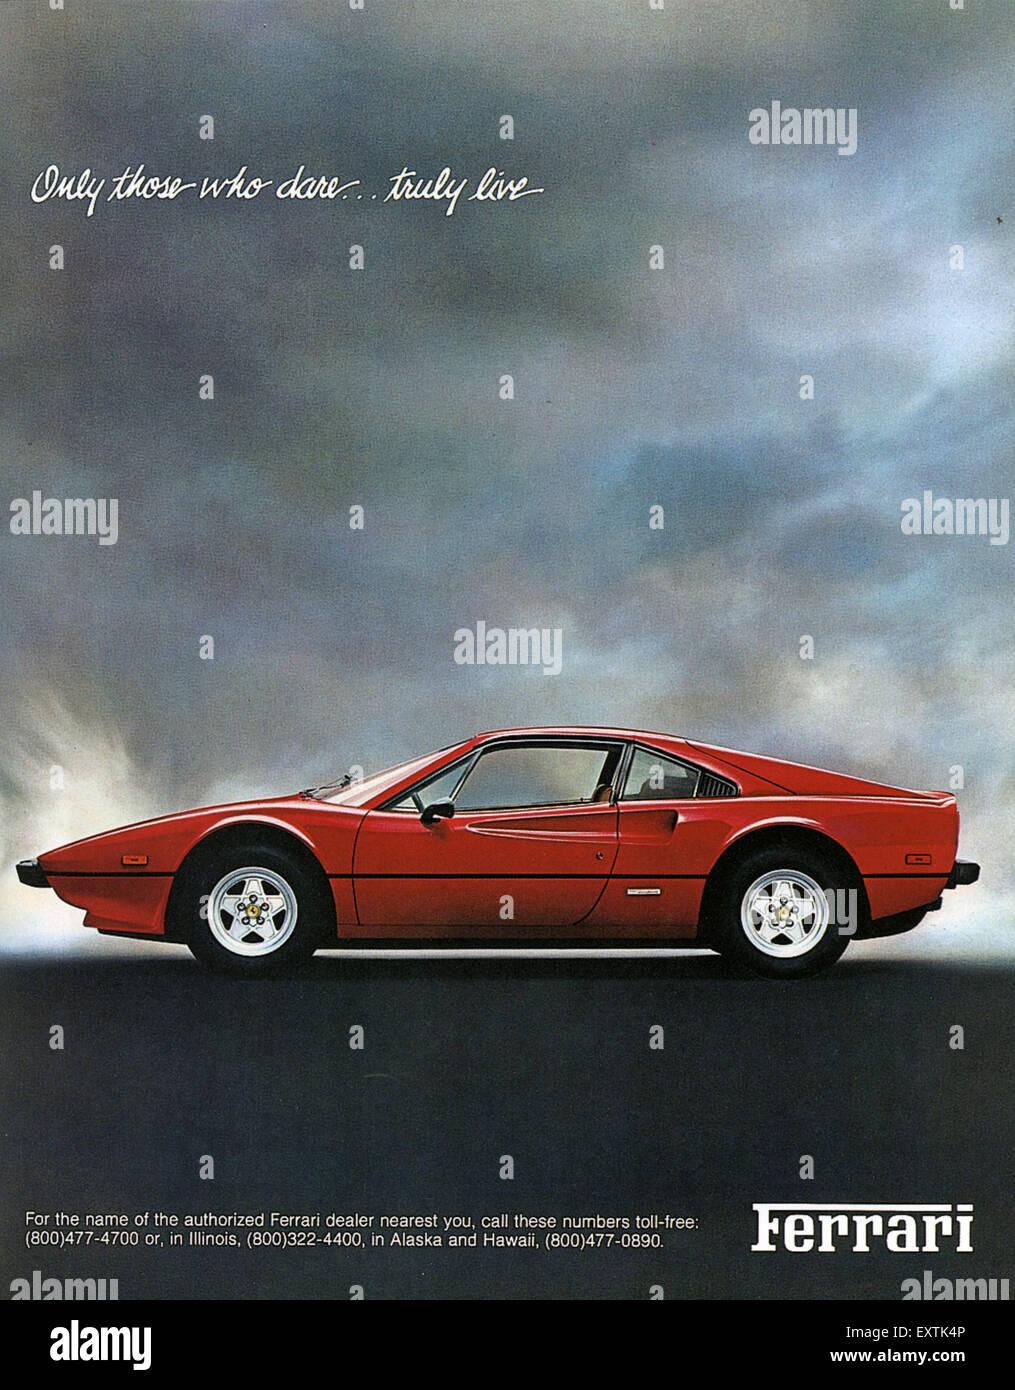 1980er Jahre Usa Ferrari Magazin Anzeige Stockfotografie Alamy